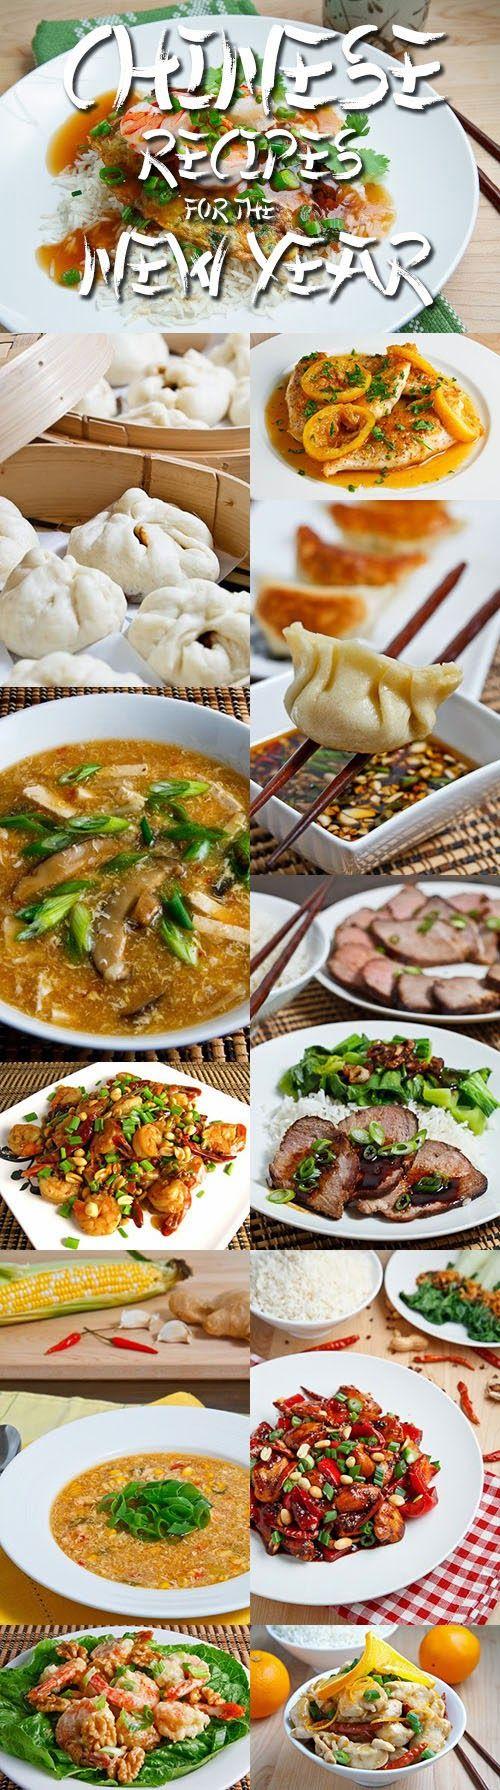 59 Best International Food Images On Pinterest Cooking Makaroni Rasa Banana Taro Closet 17 Chinese Recipes For The New Year